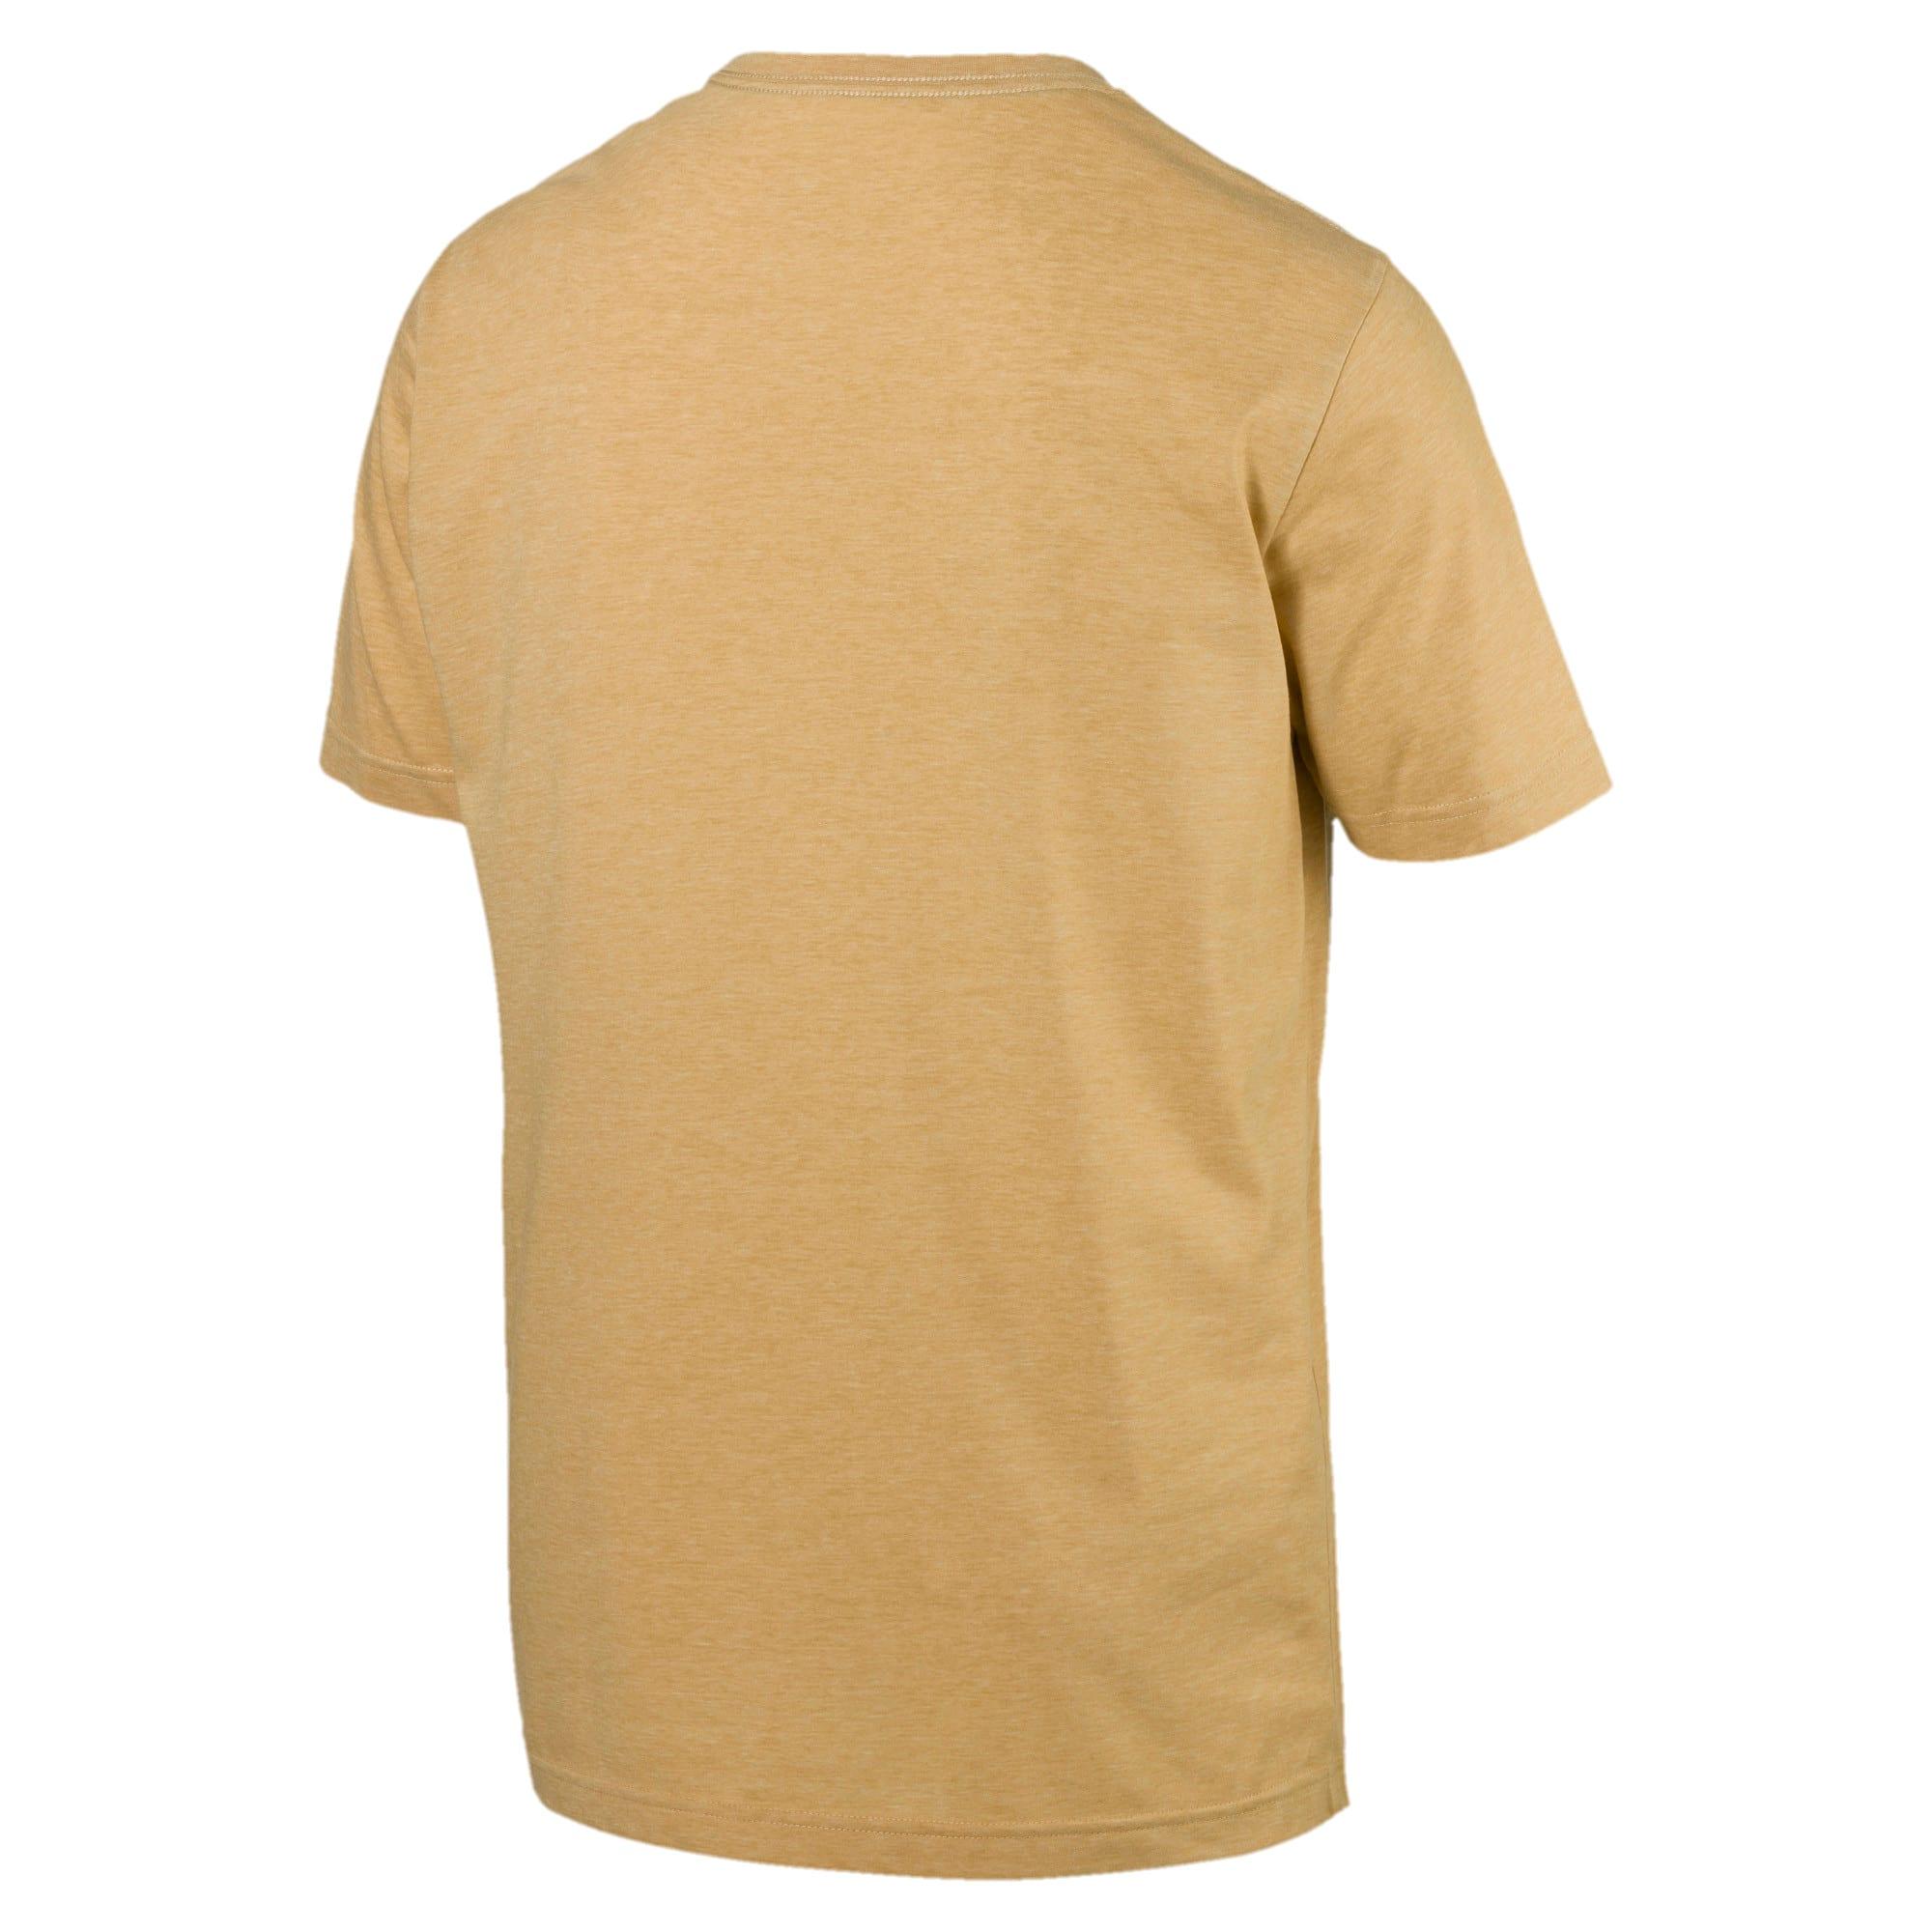 Thumbnail 2 of Indispensabili+ T-shirt mélange uomo, Taos Taupe Heather, medium